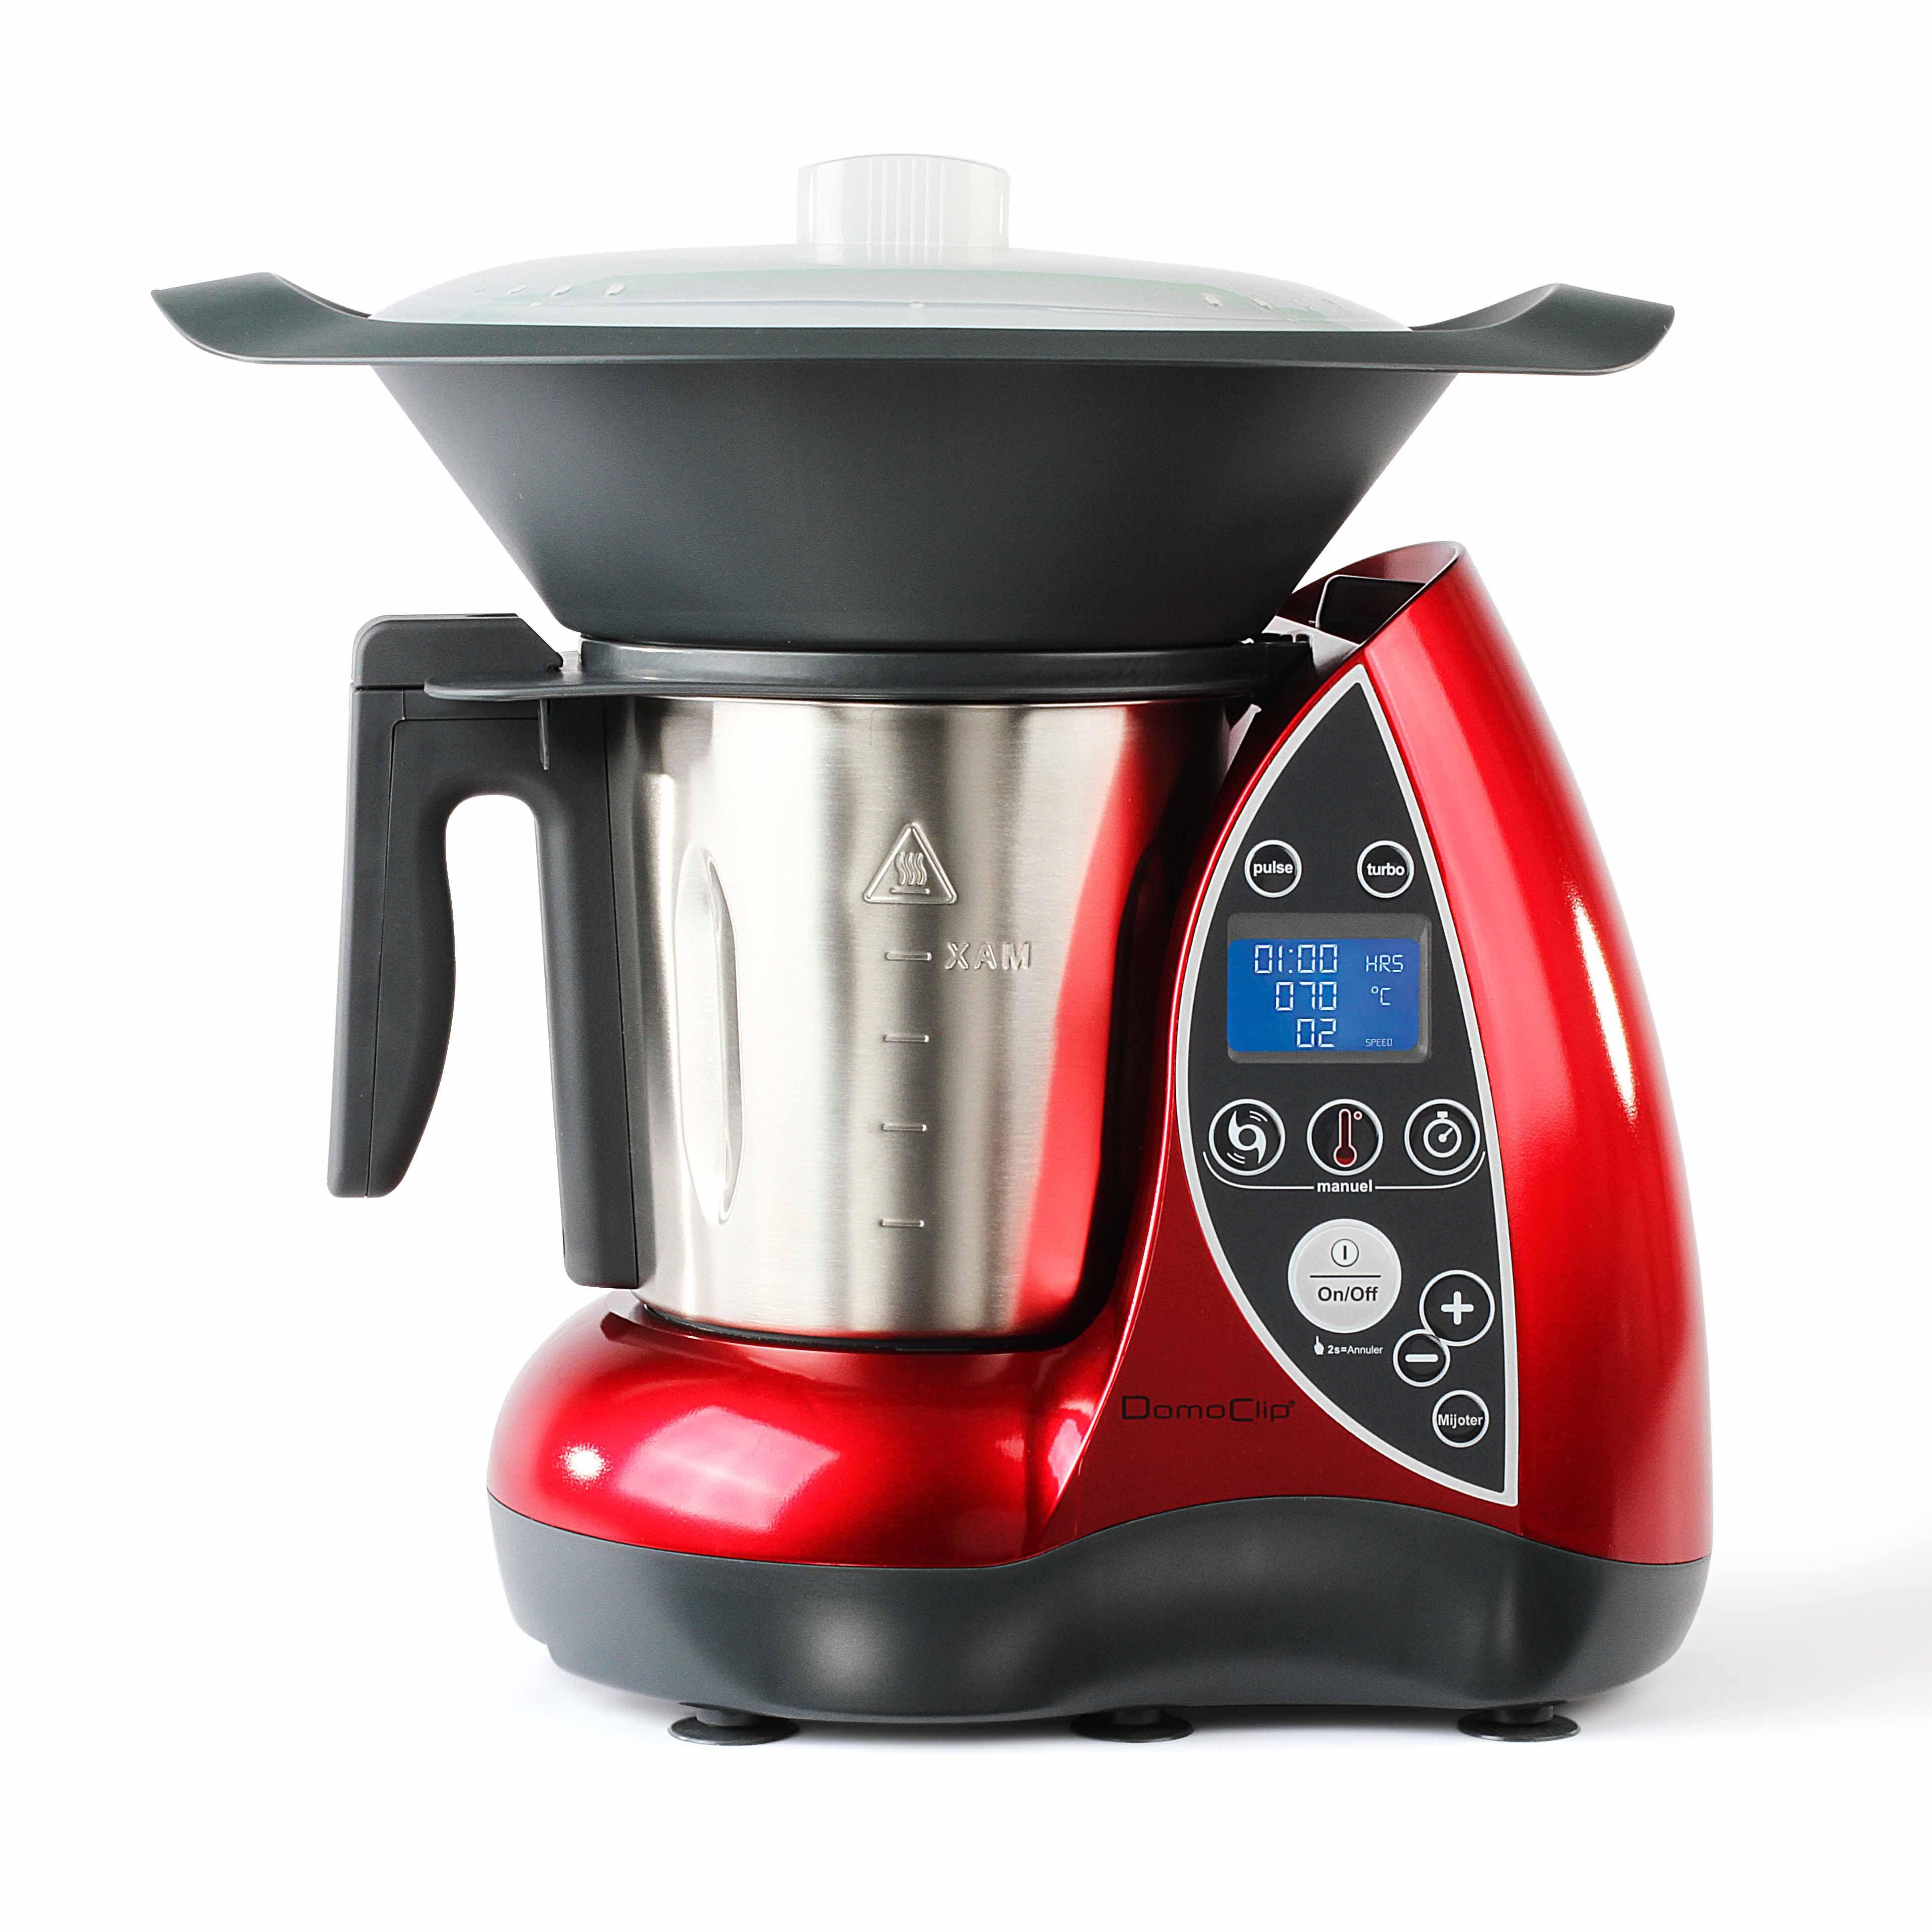 Domoclip robot culinaire chauffant dop142 achat robot - Robot per cucinare ...